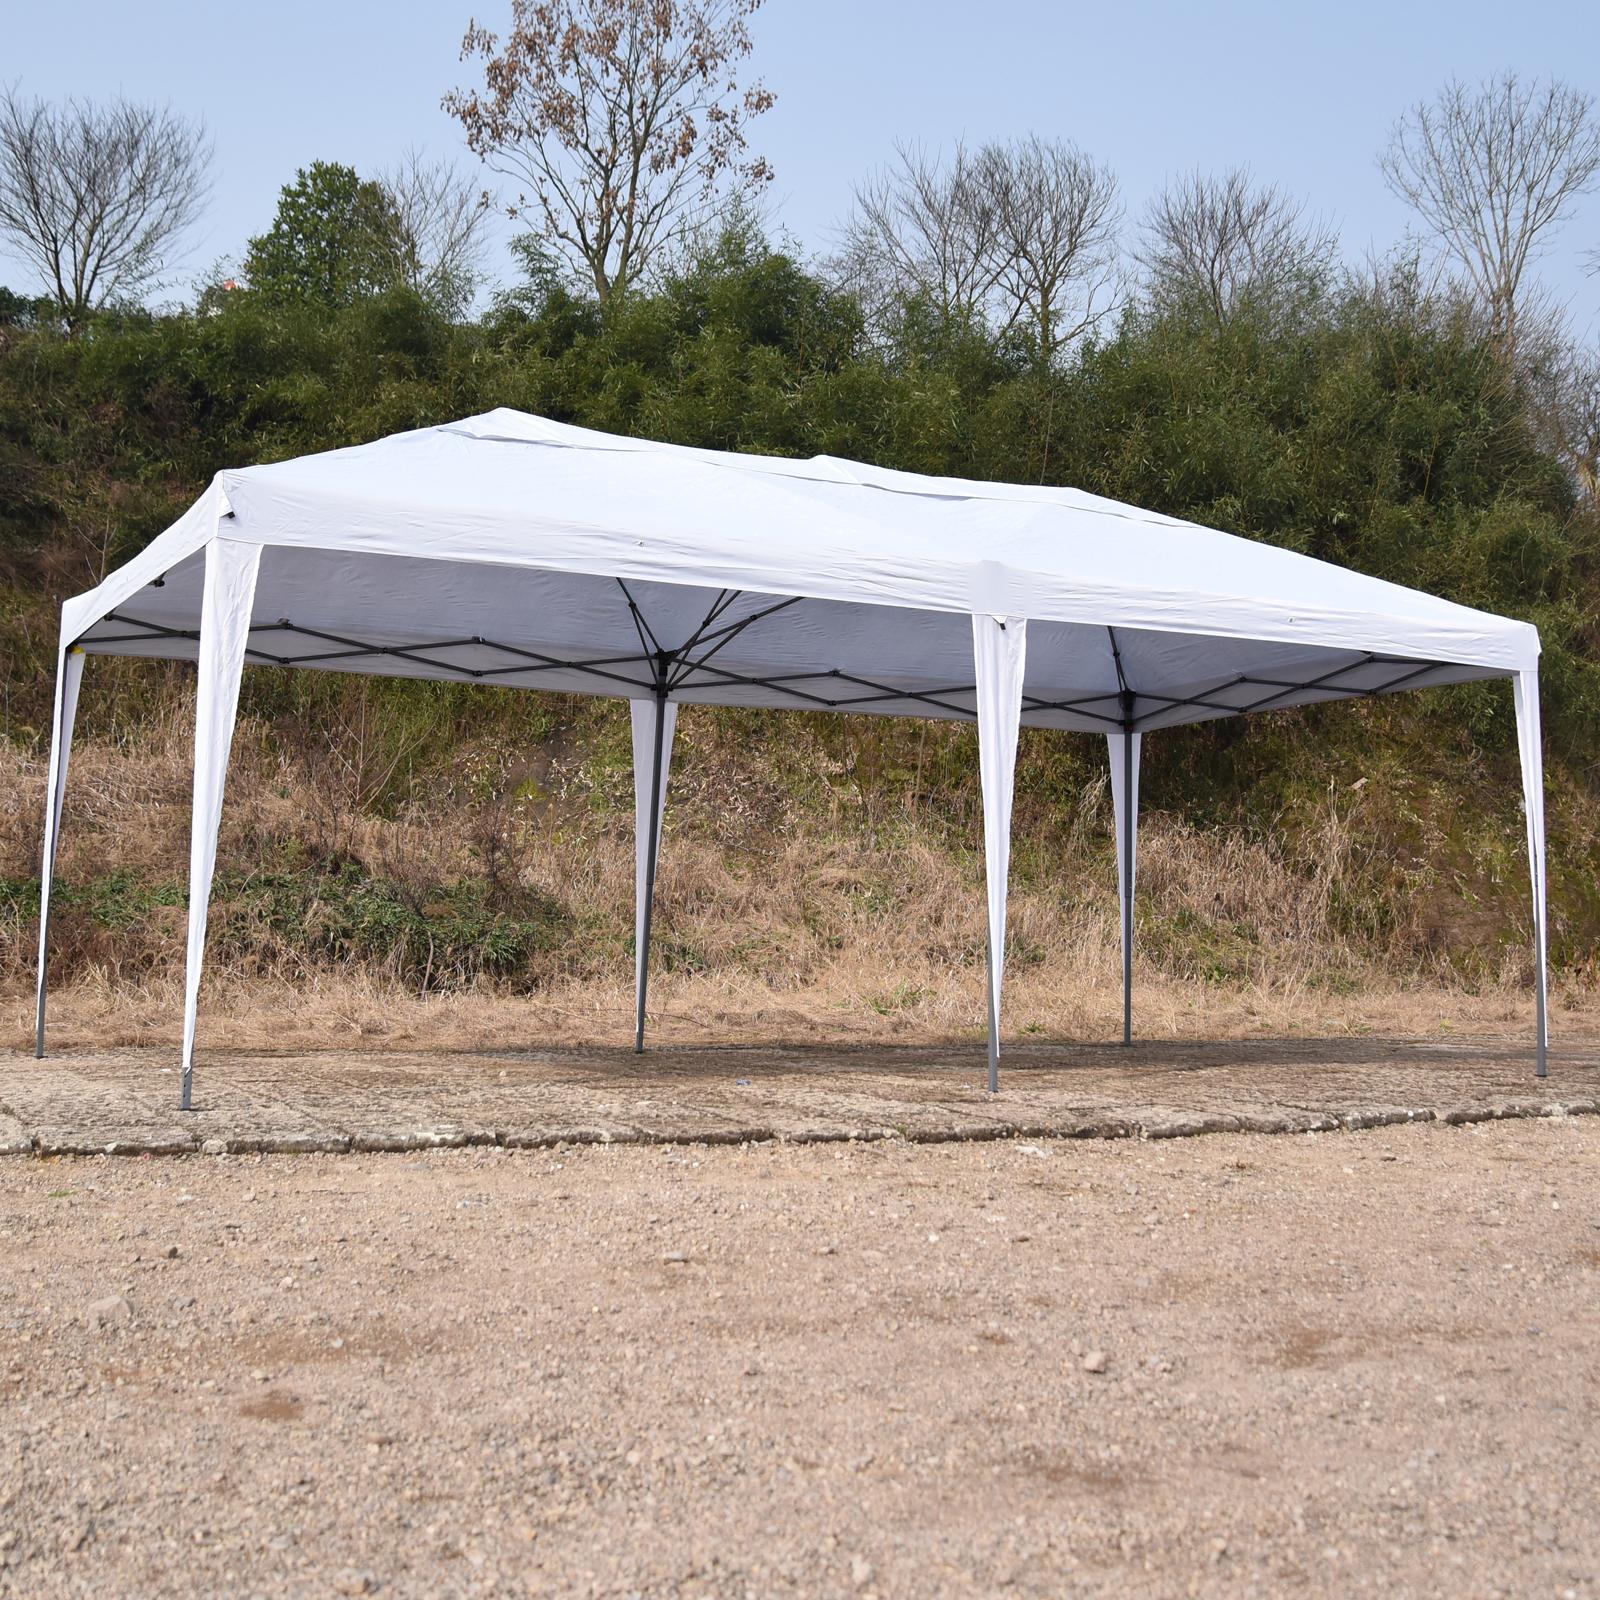 Outdoor-10-039-x20-039-EZ-POP-UP-Gazebo-Wedding-Party-Tent-Canopy-Folding-w-Carry-Bag thumbnail 45